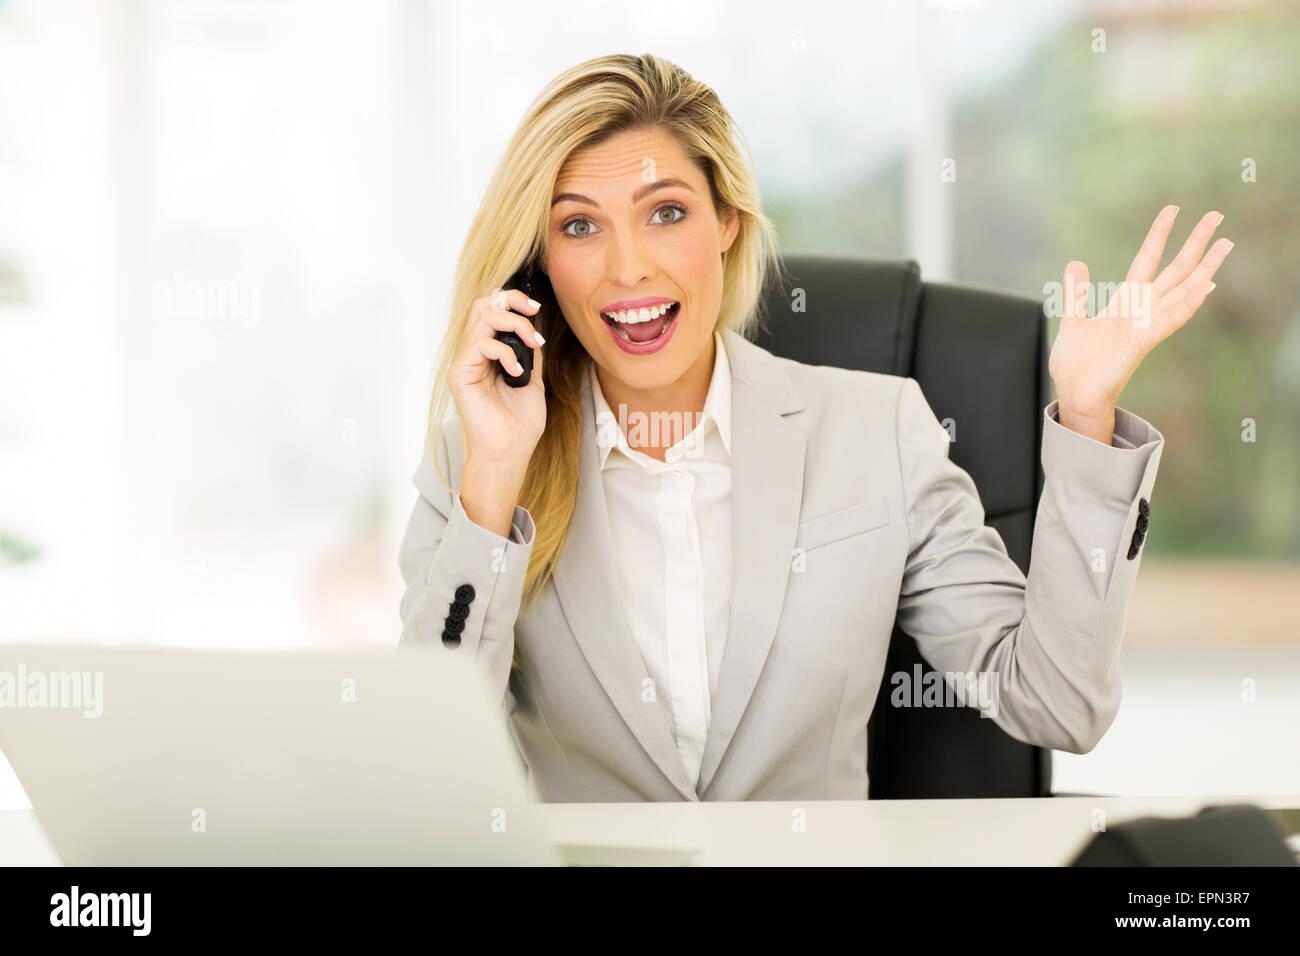 Felice imprenditrice ricevere notizie entusiasmanti per telefono Immagini Stock